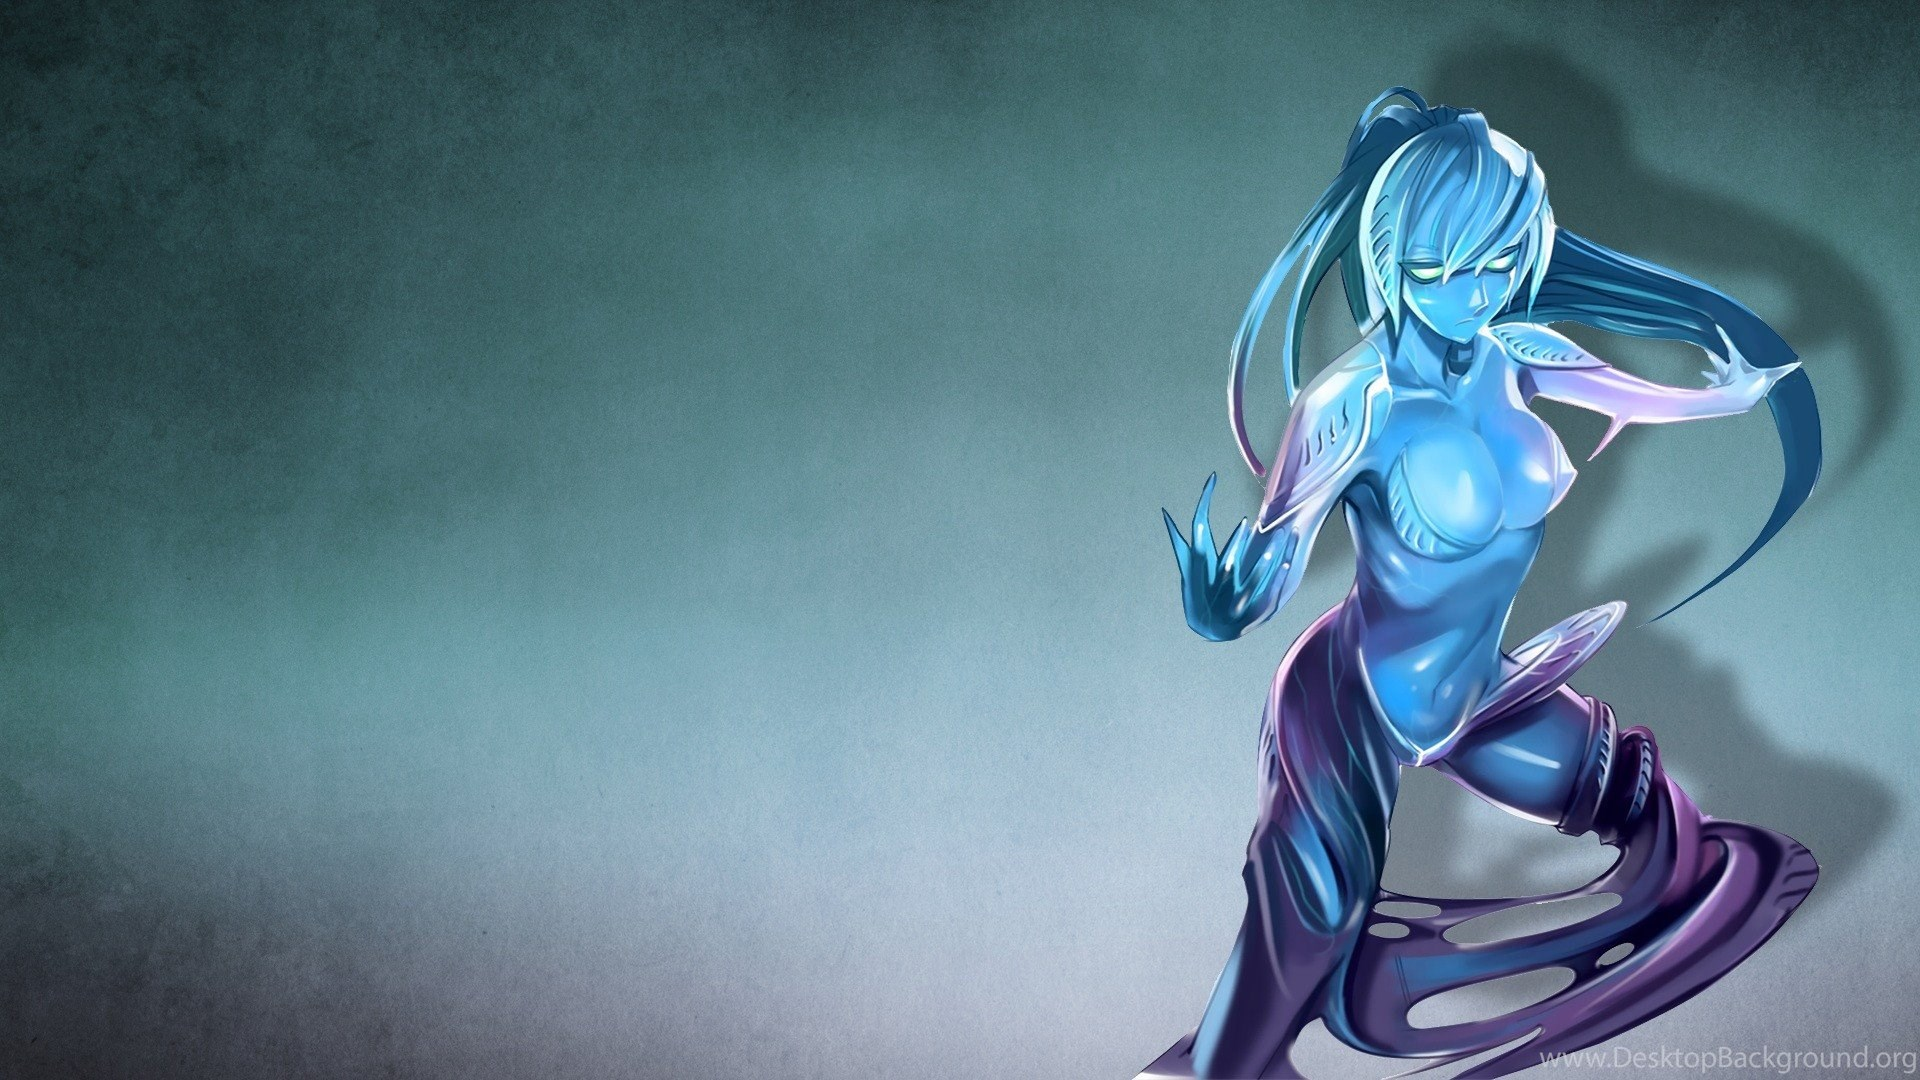 Superhd Pics Metroid Women Zero Suit Samus Aran Artwork Desktop